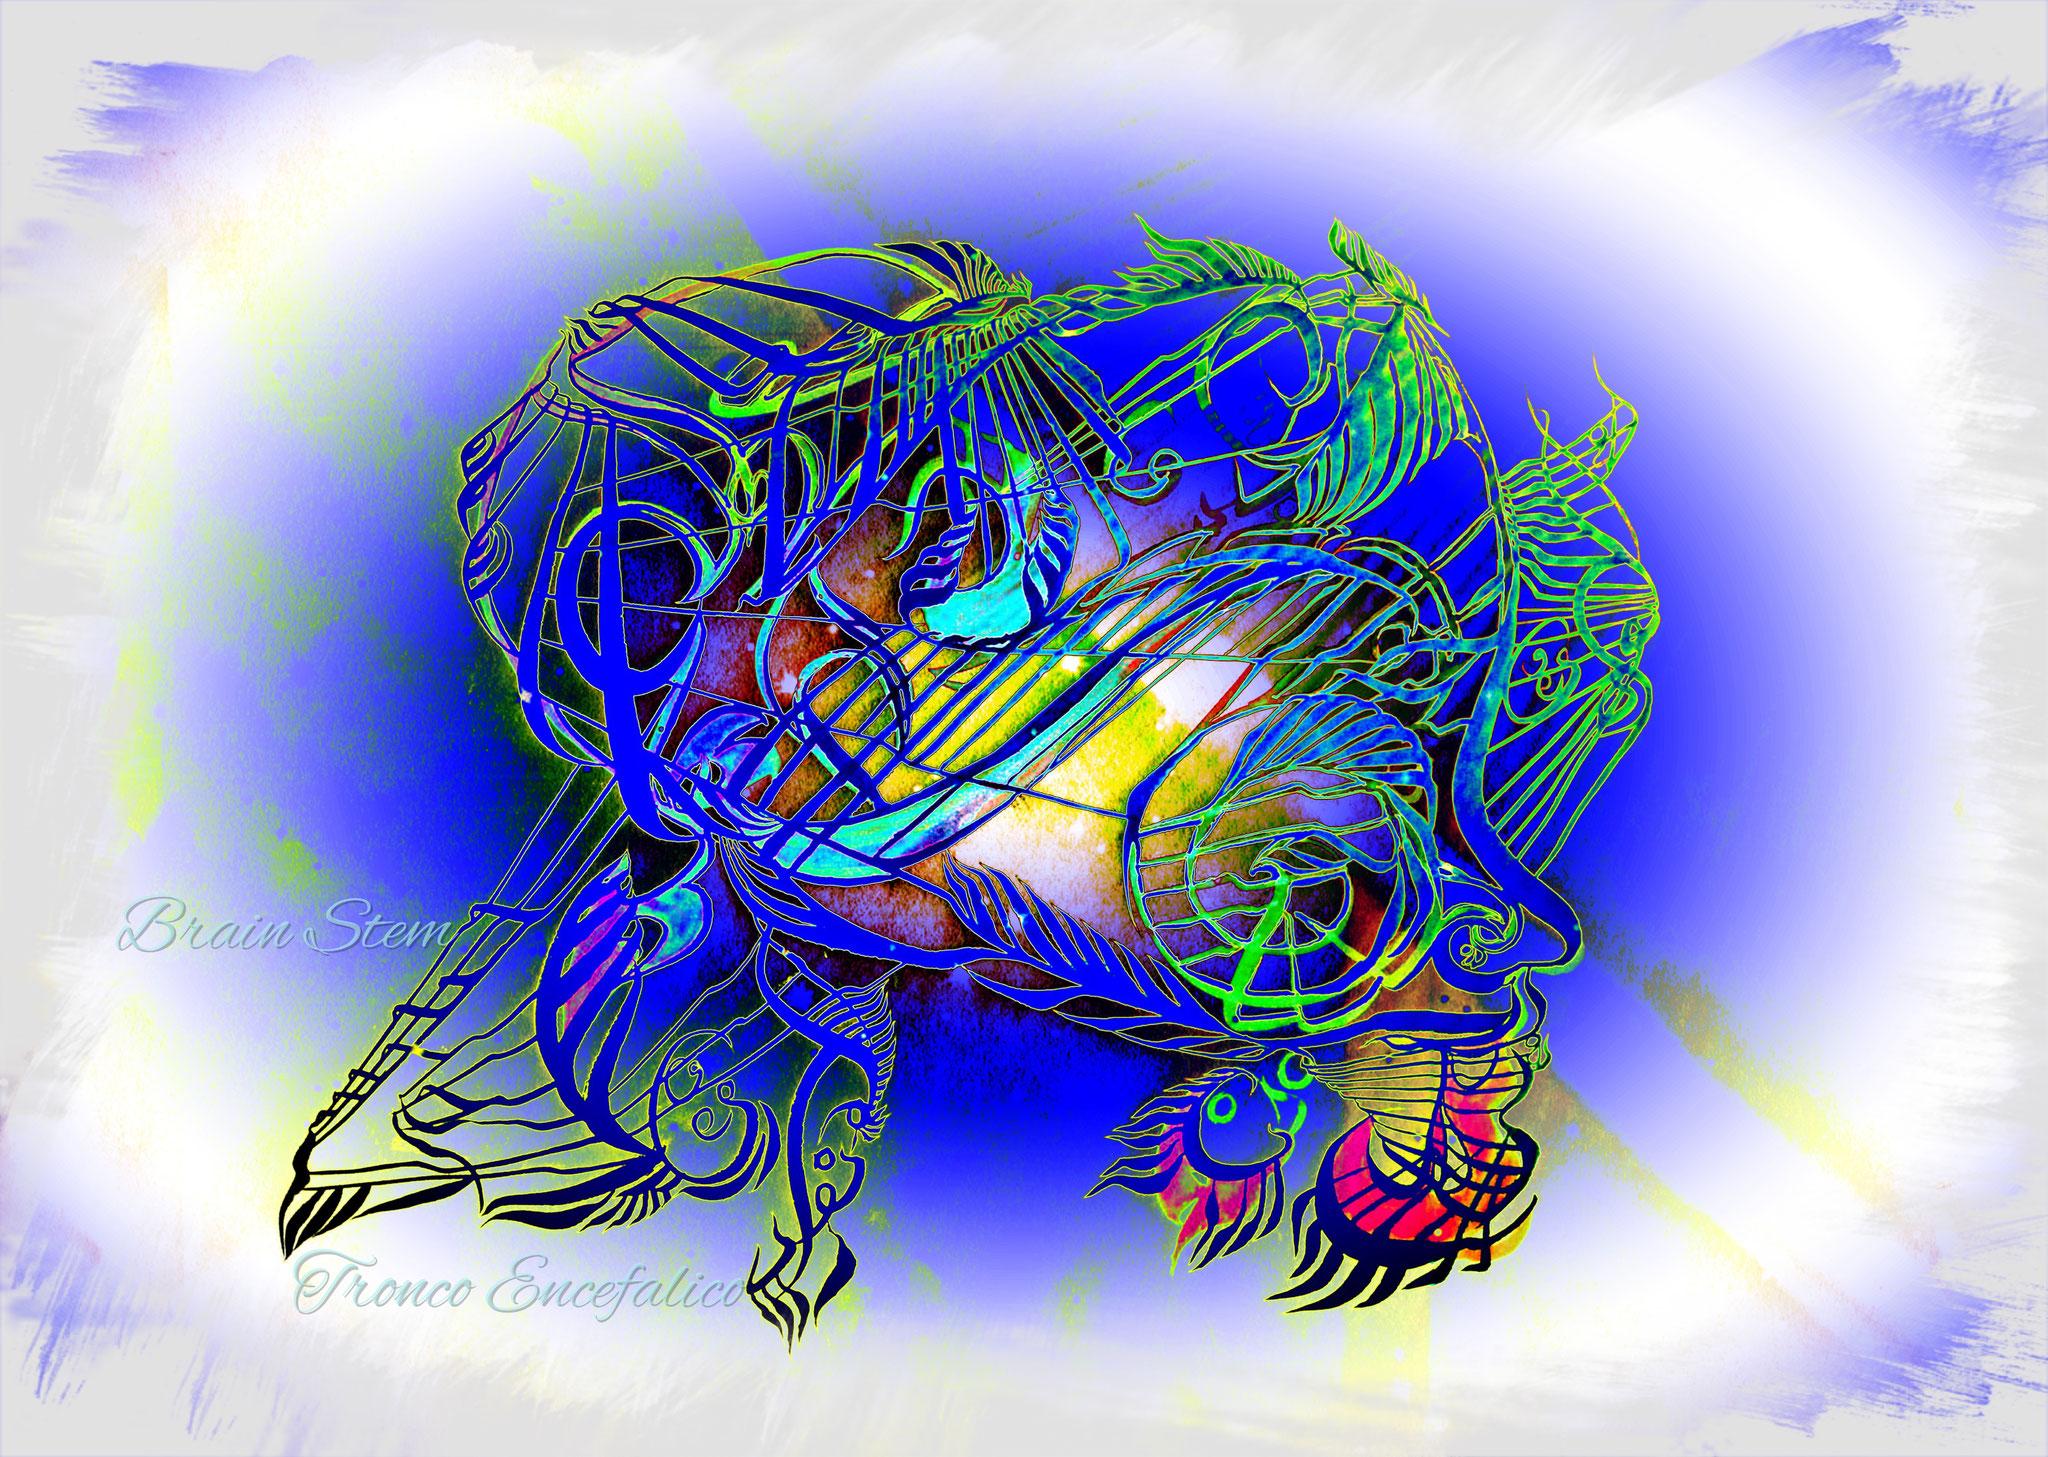 Tronc cerebrale